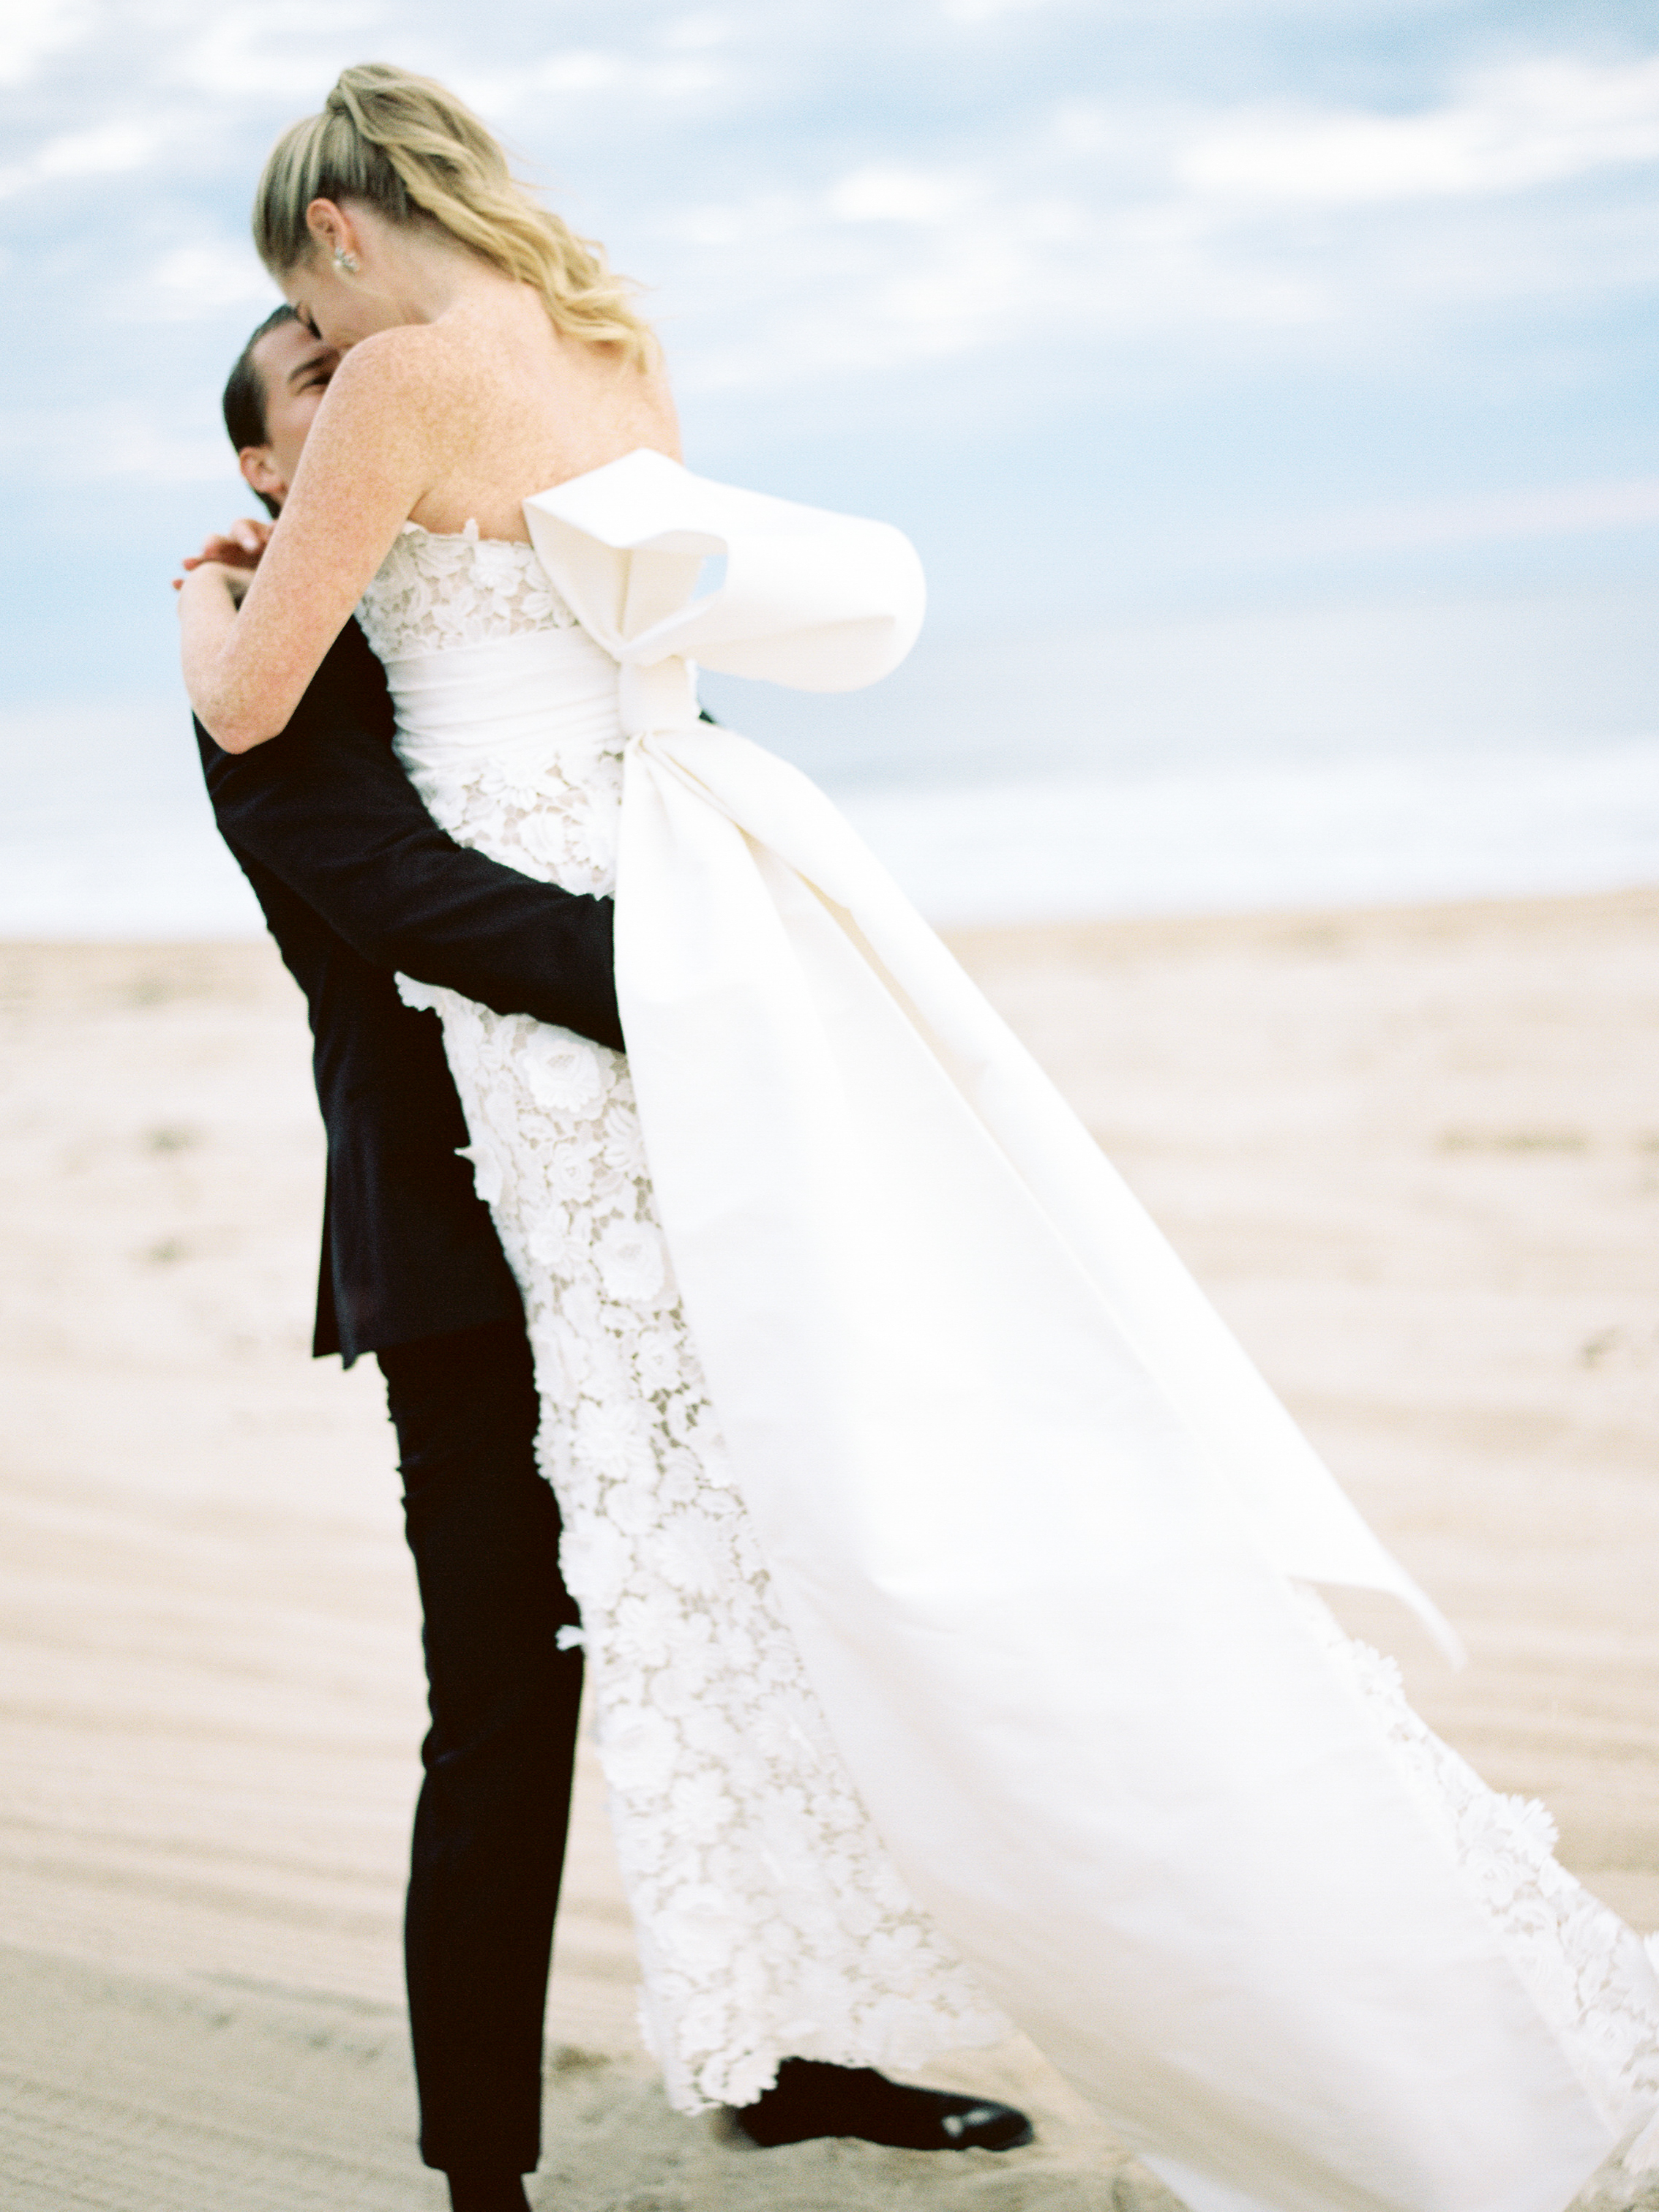 New England, coastal wedding, wedding decor, romantic wedding, Rhode Island, Nicole Simeral